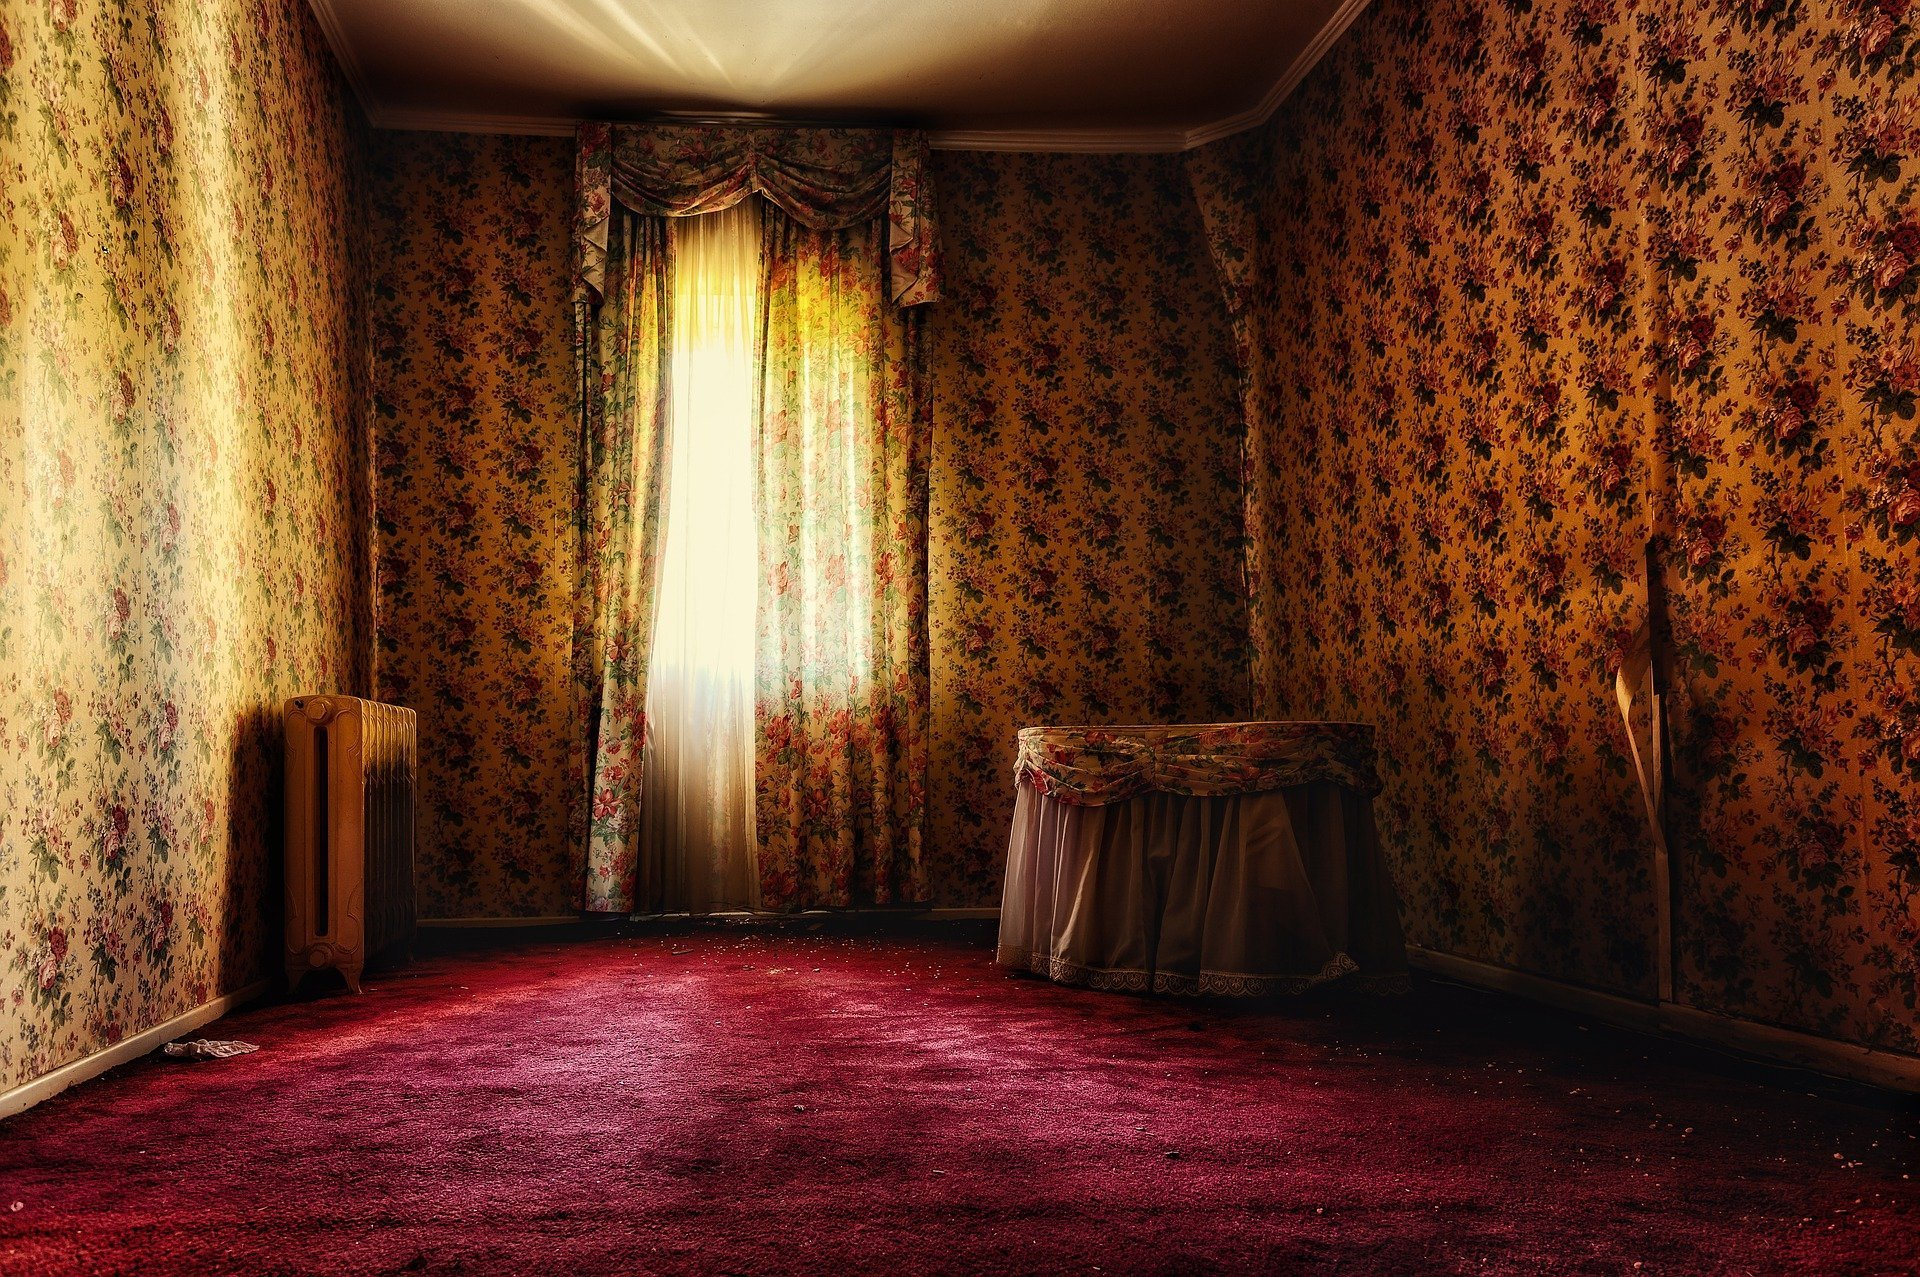 The Urn Horror Flash Fiction By Eureka Vaughn